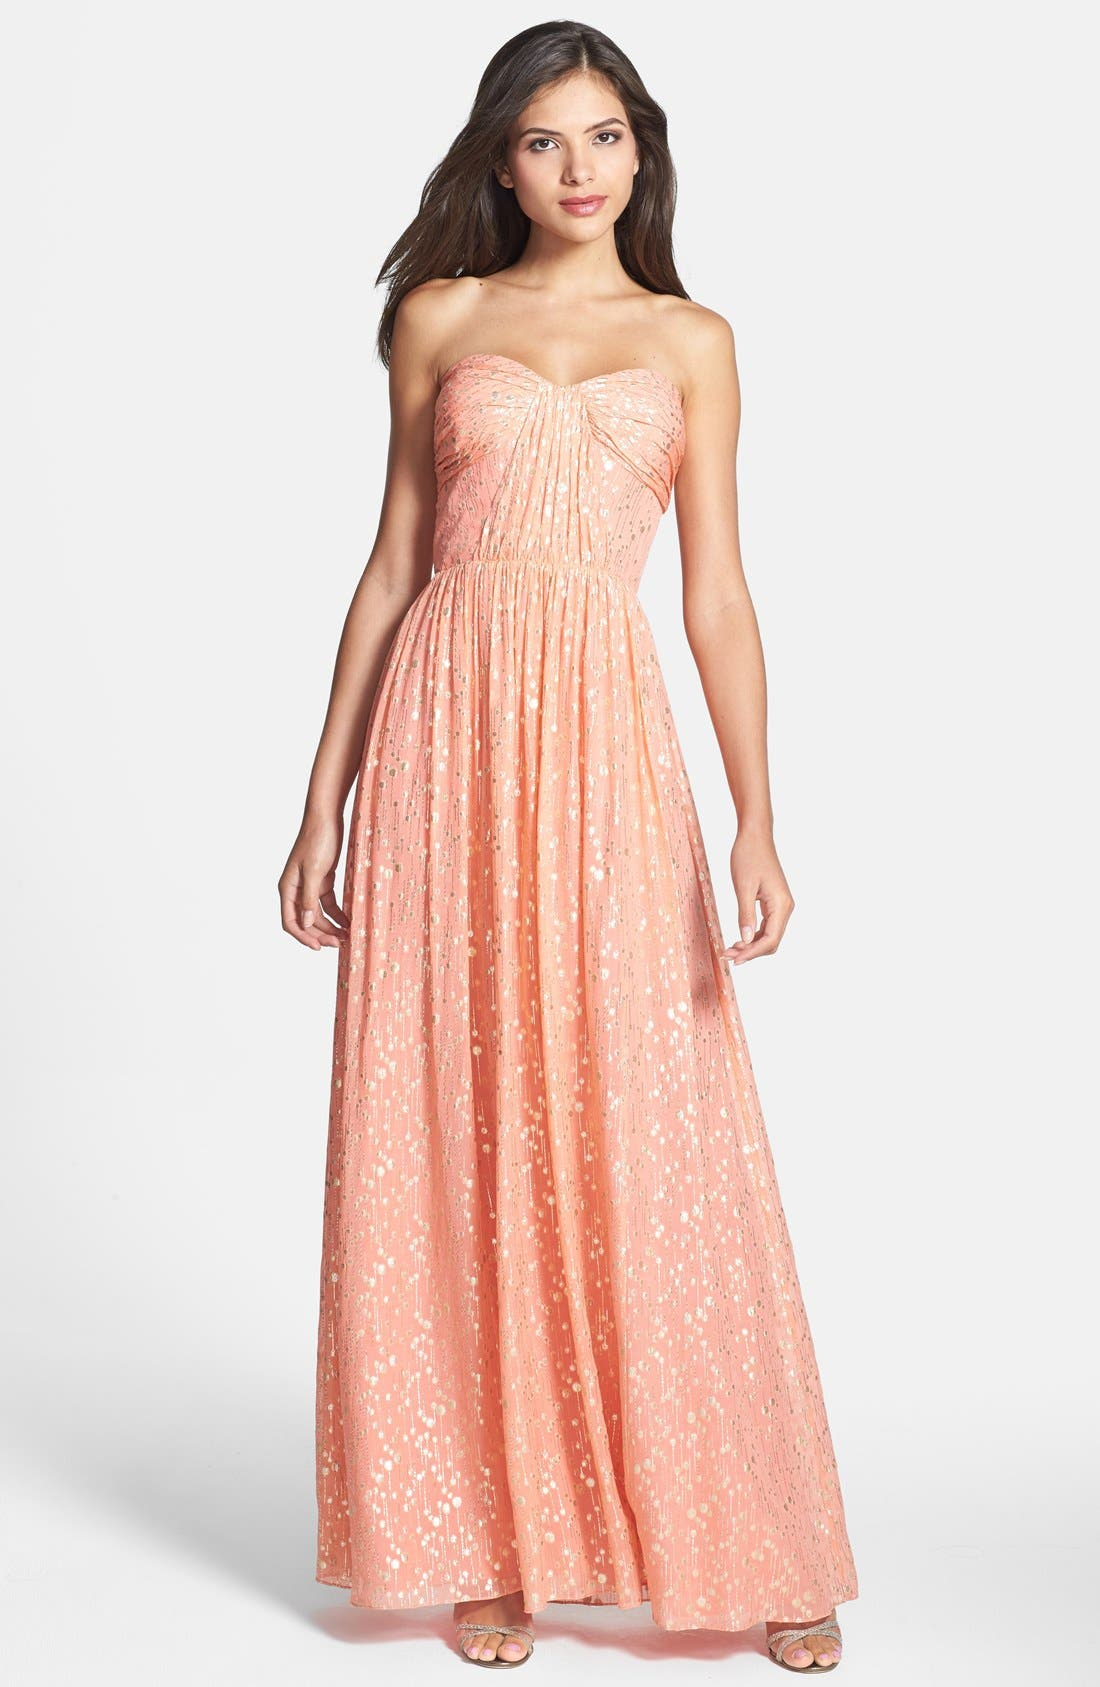 ERIN ERIN FETHERSTON 'Monique' Foiled Silk Chiffon Gown, Main, color, 950